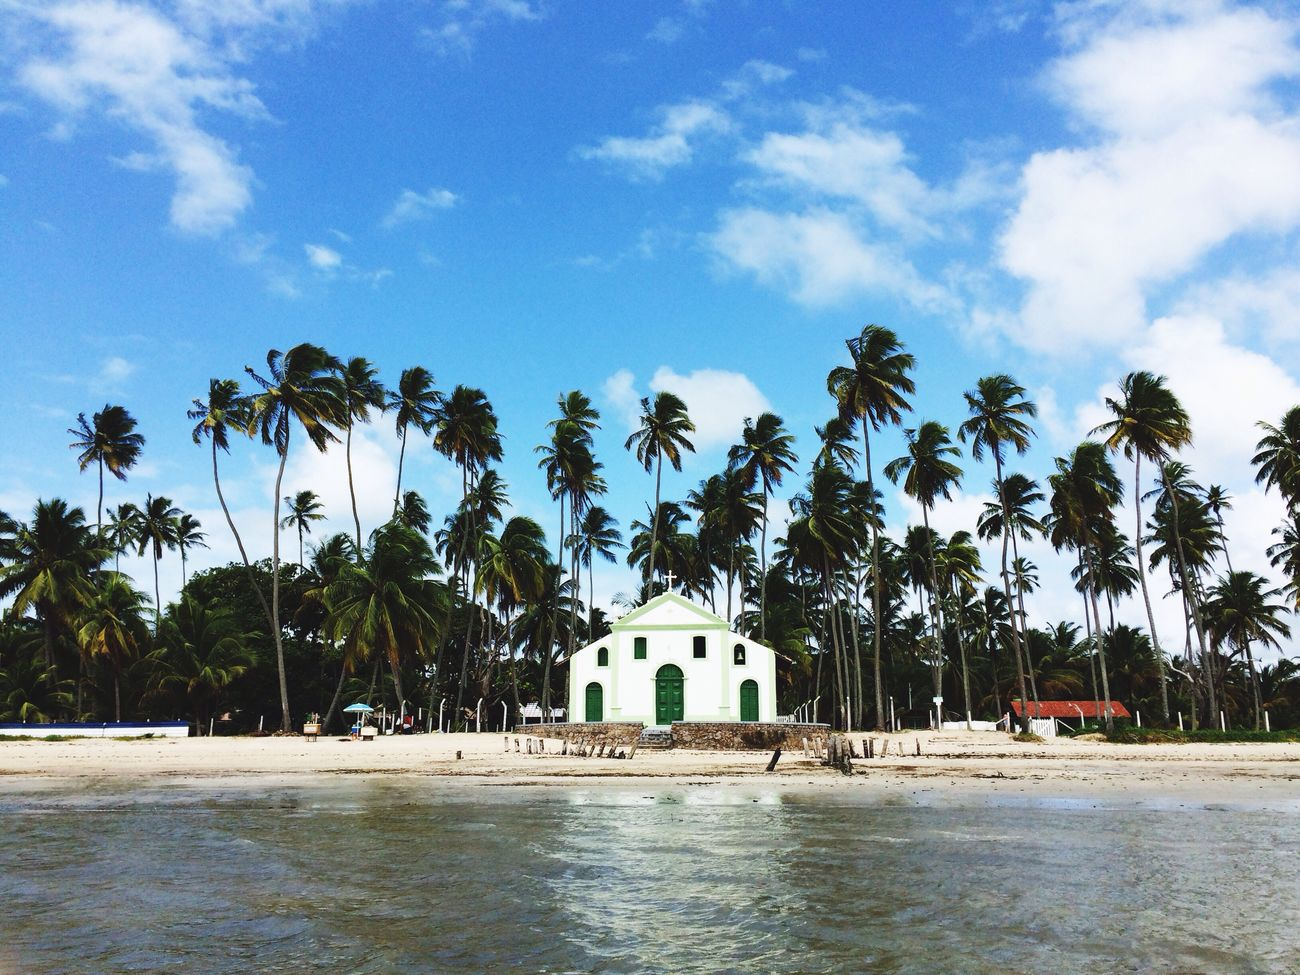 Praia Dos Carneiros Igrejinha Church Barroco Colonial The Great Outdoors - 2016 EyeEm Awards